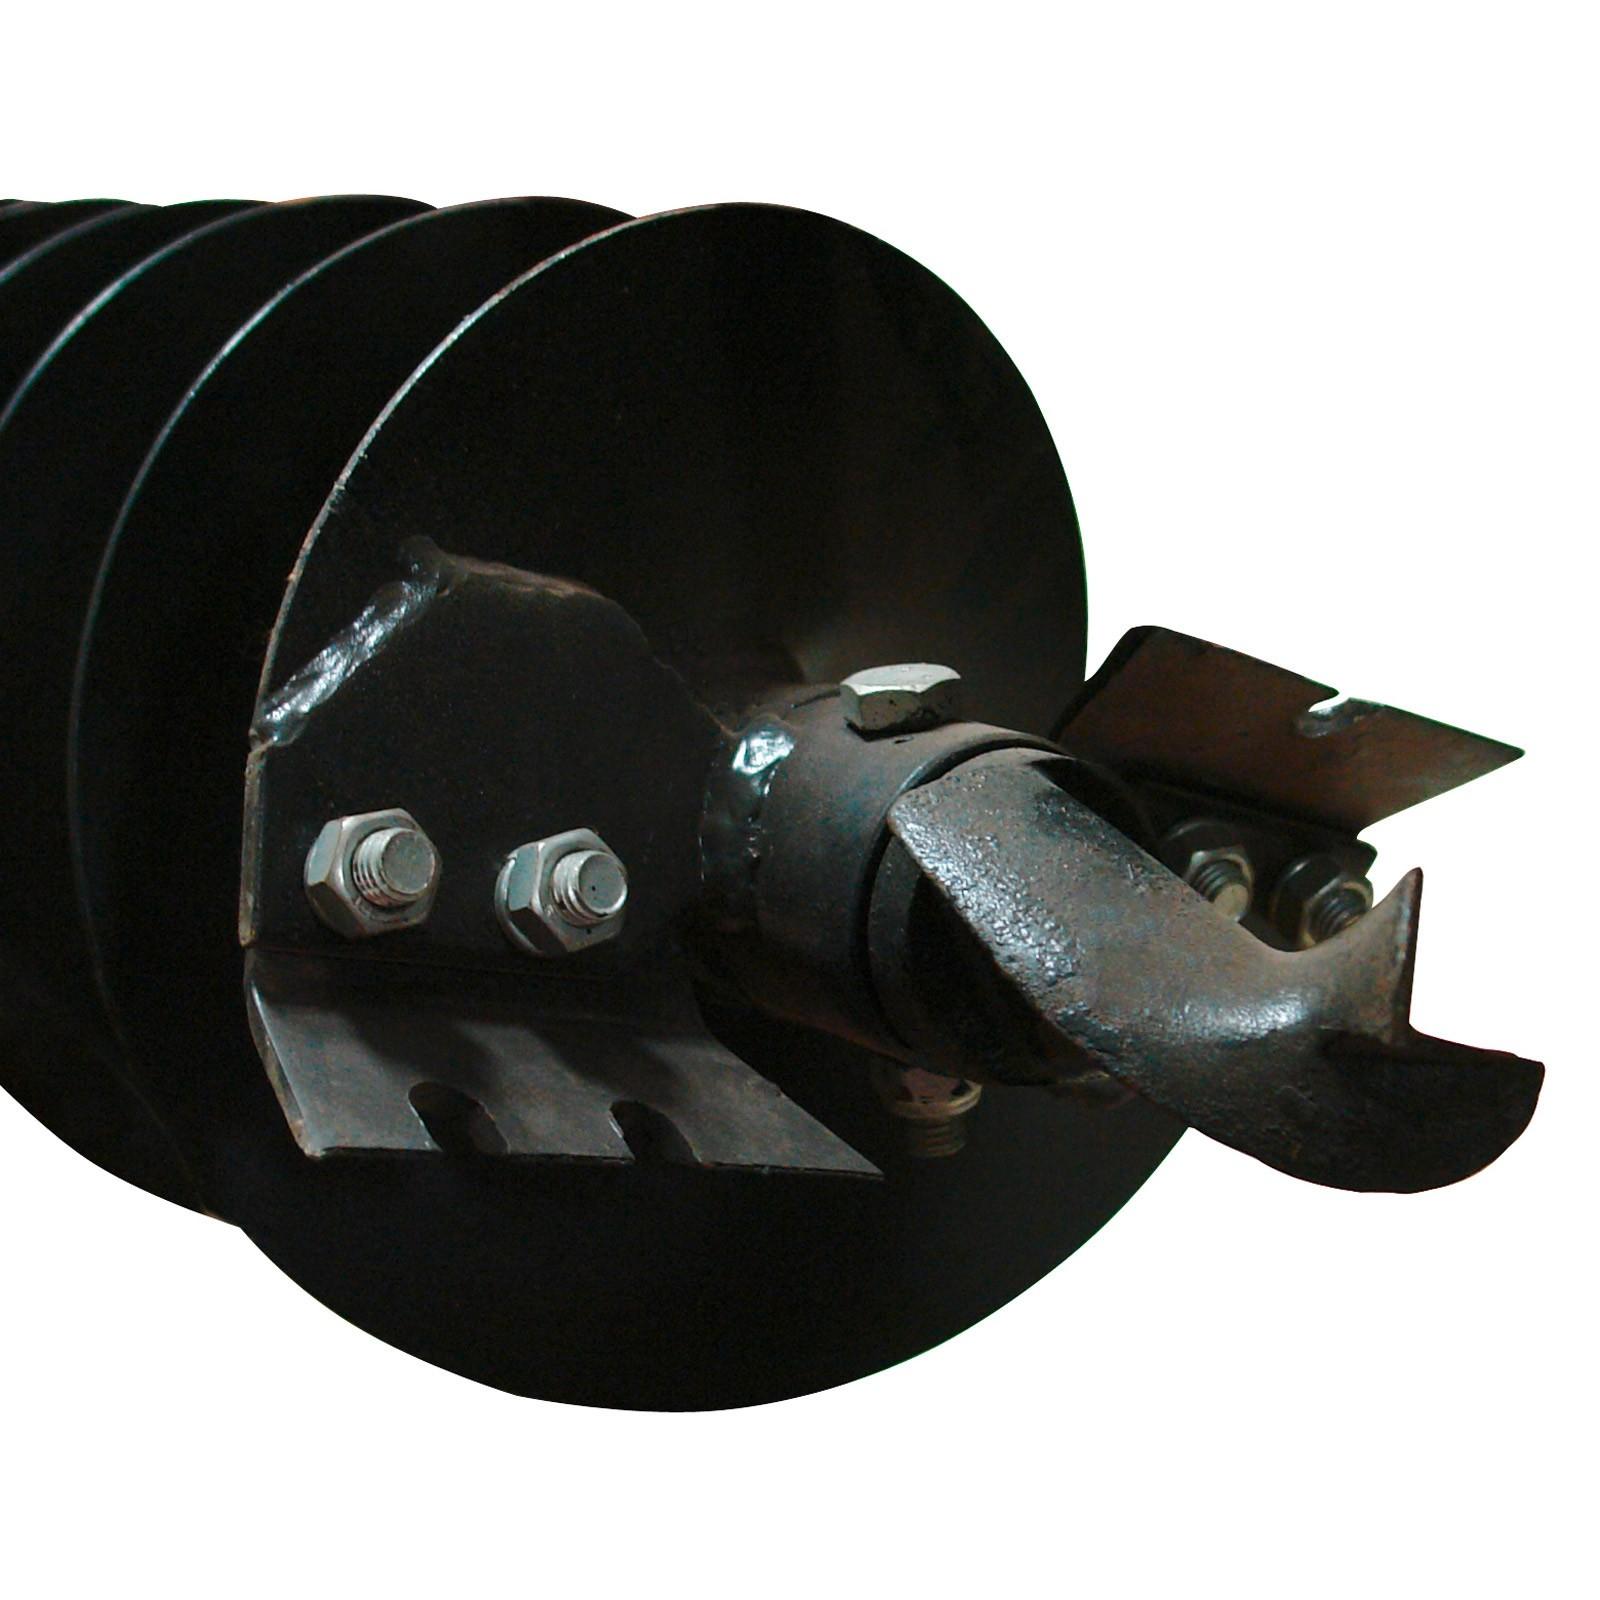 zapfwellen erdbohrer pfahlbohrer 220 mm mit zapfwelle im set. Black Bedroom Furniture Sets. Home Design Ideas